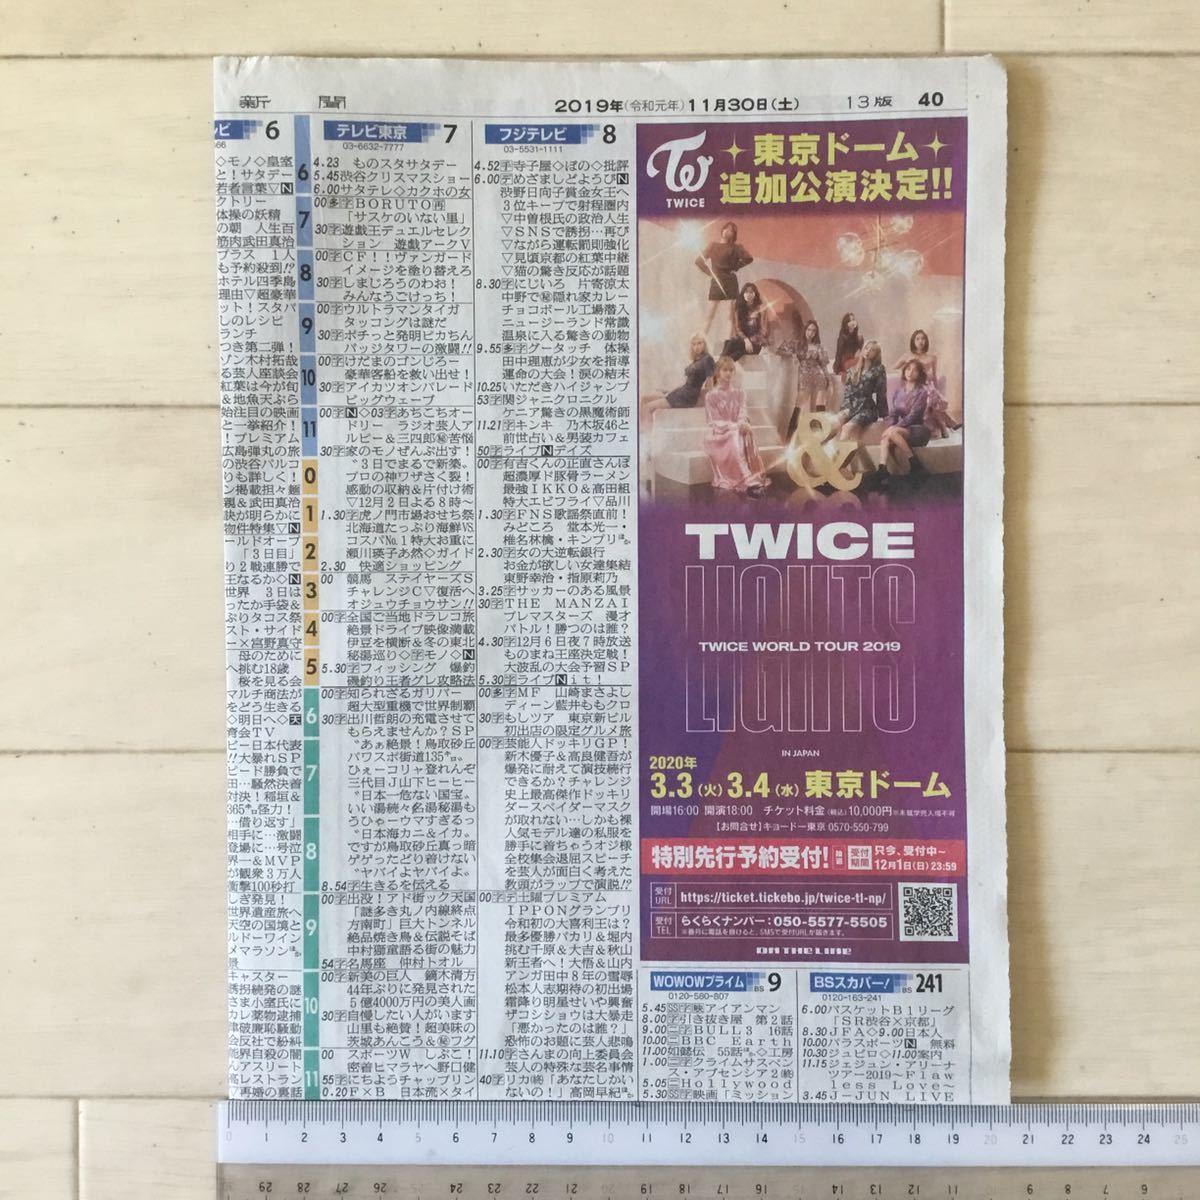 値下↓TWICE WORLD TOUR 2019 東京ドーム追加公演決定 朝日新聞記事紙面191130_画像4